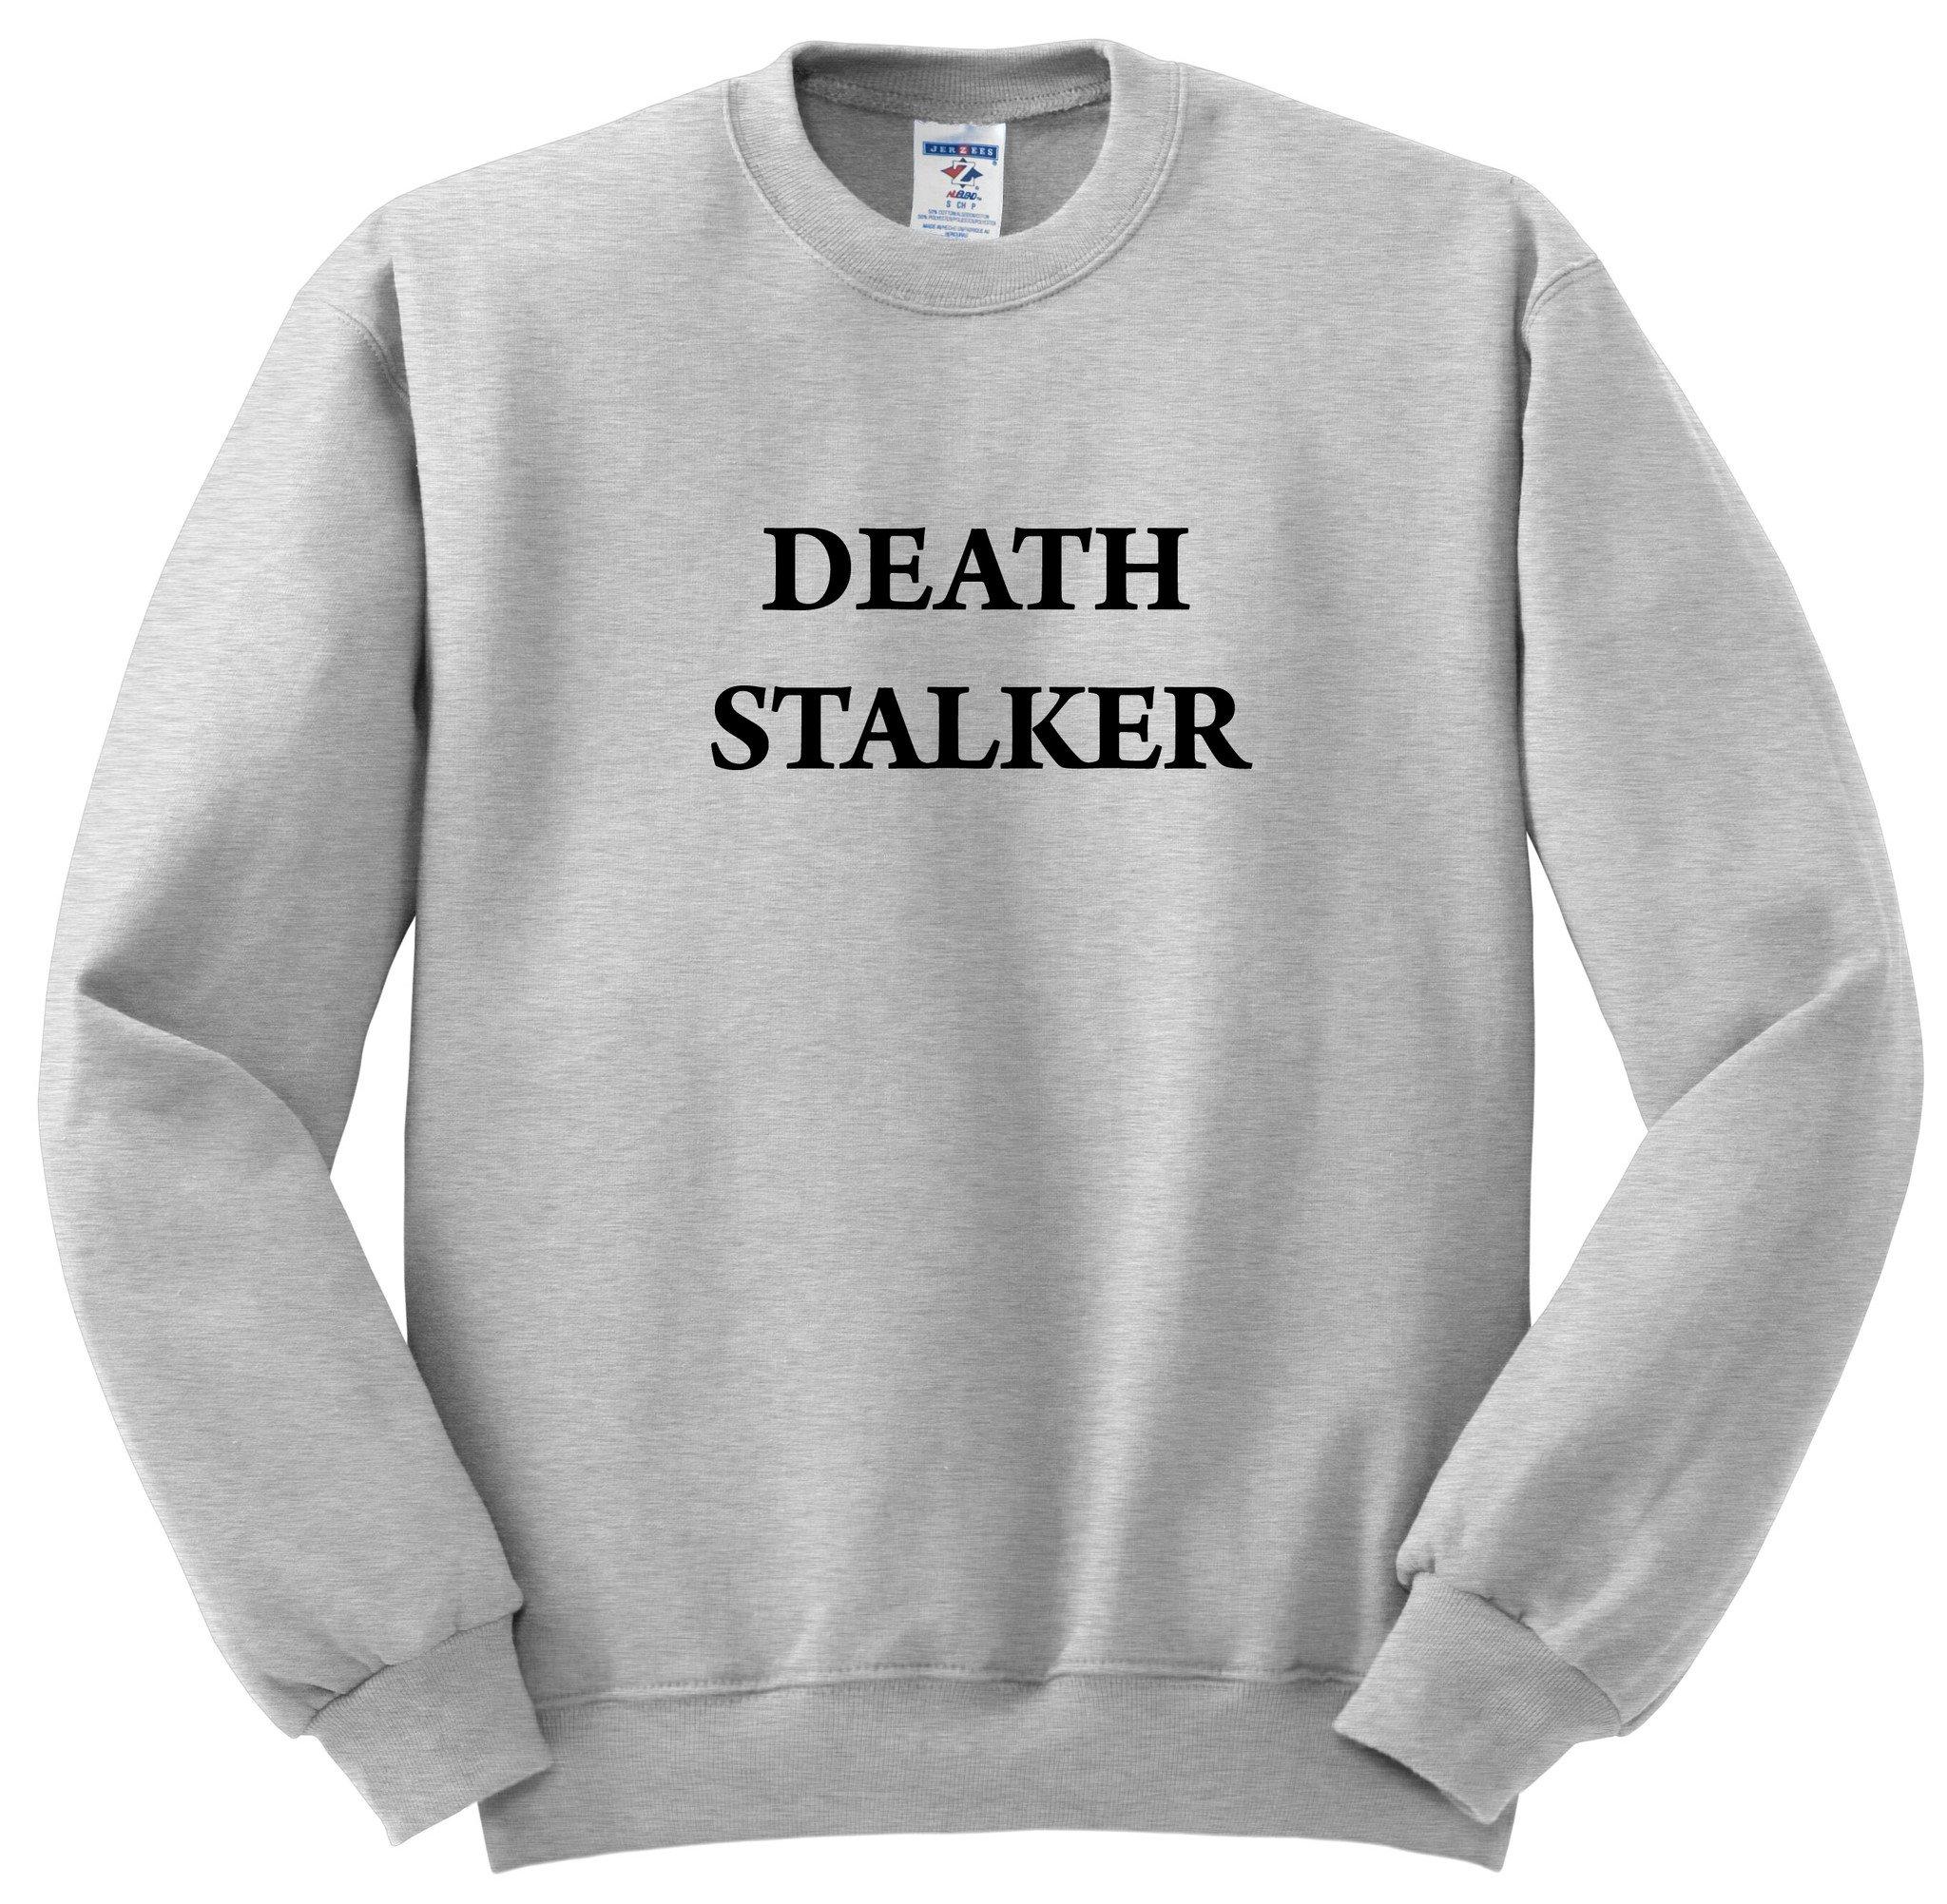 death stalker sweatshirt